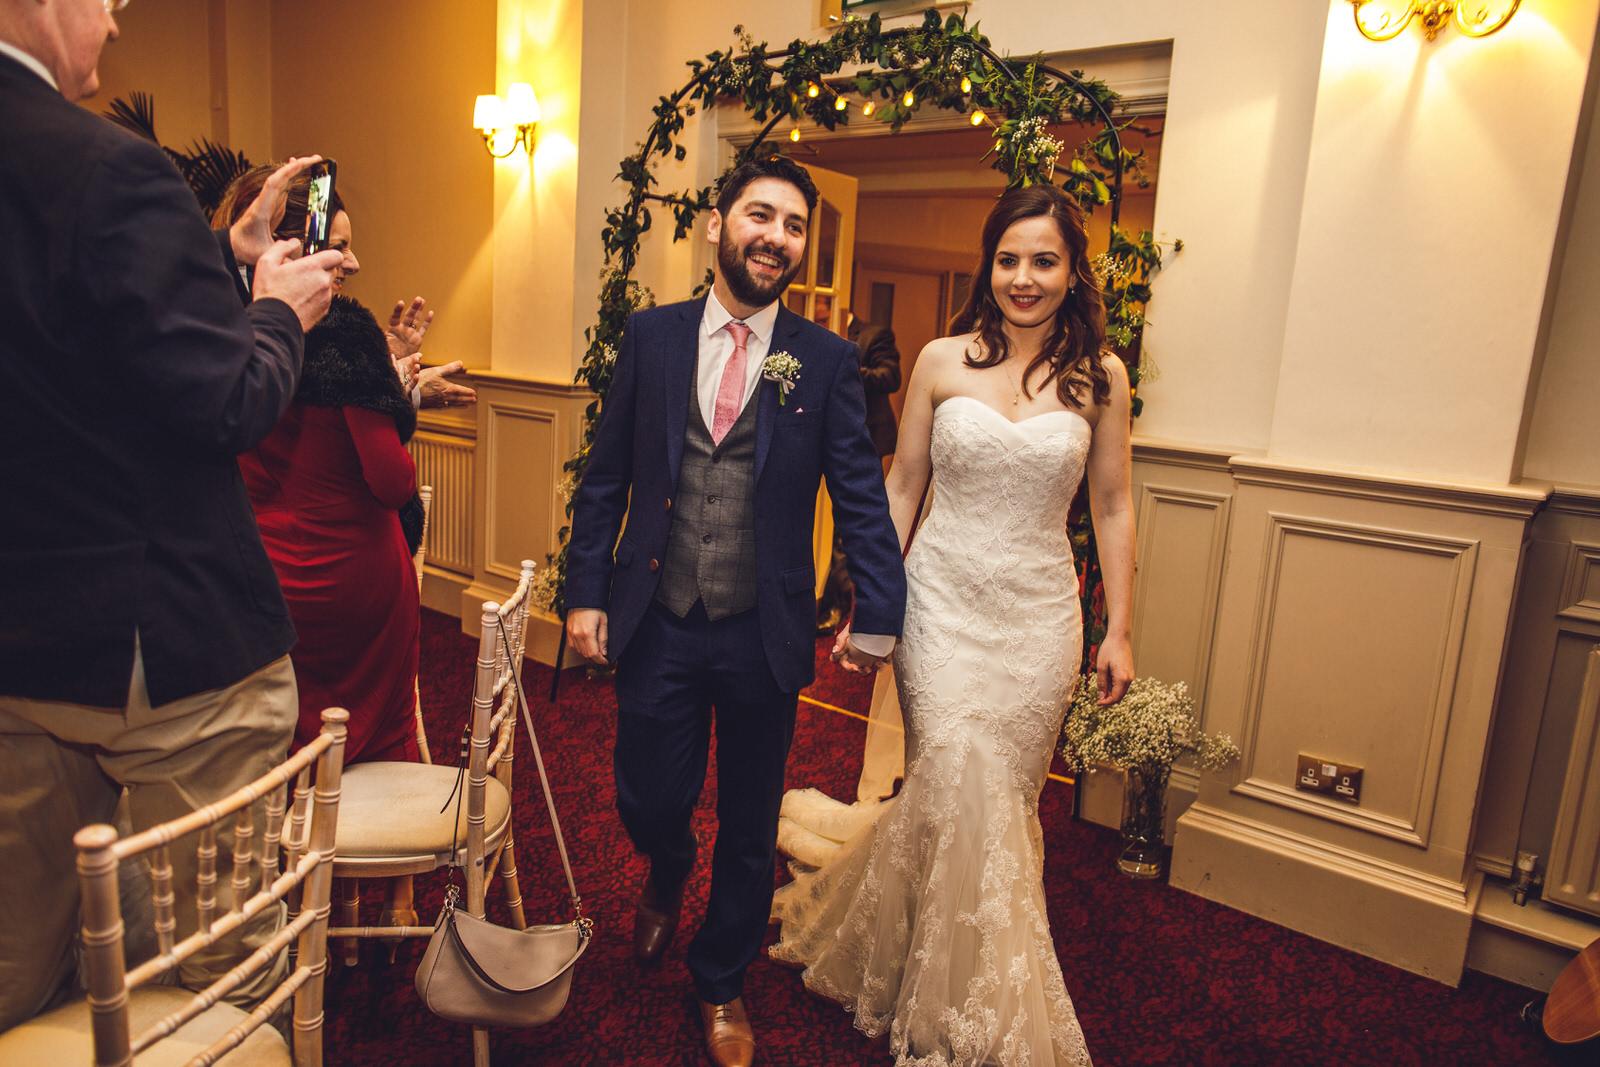 Roger-kenny-wedding-photographer-greystones-wicklow-dublin_097.jpg